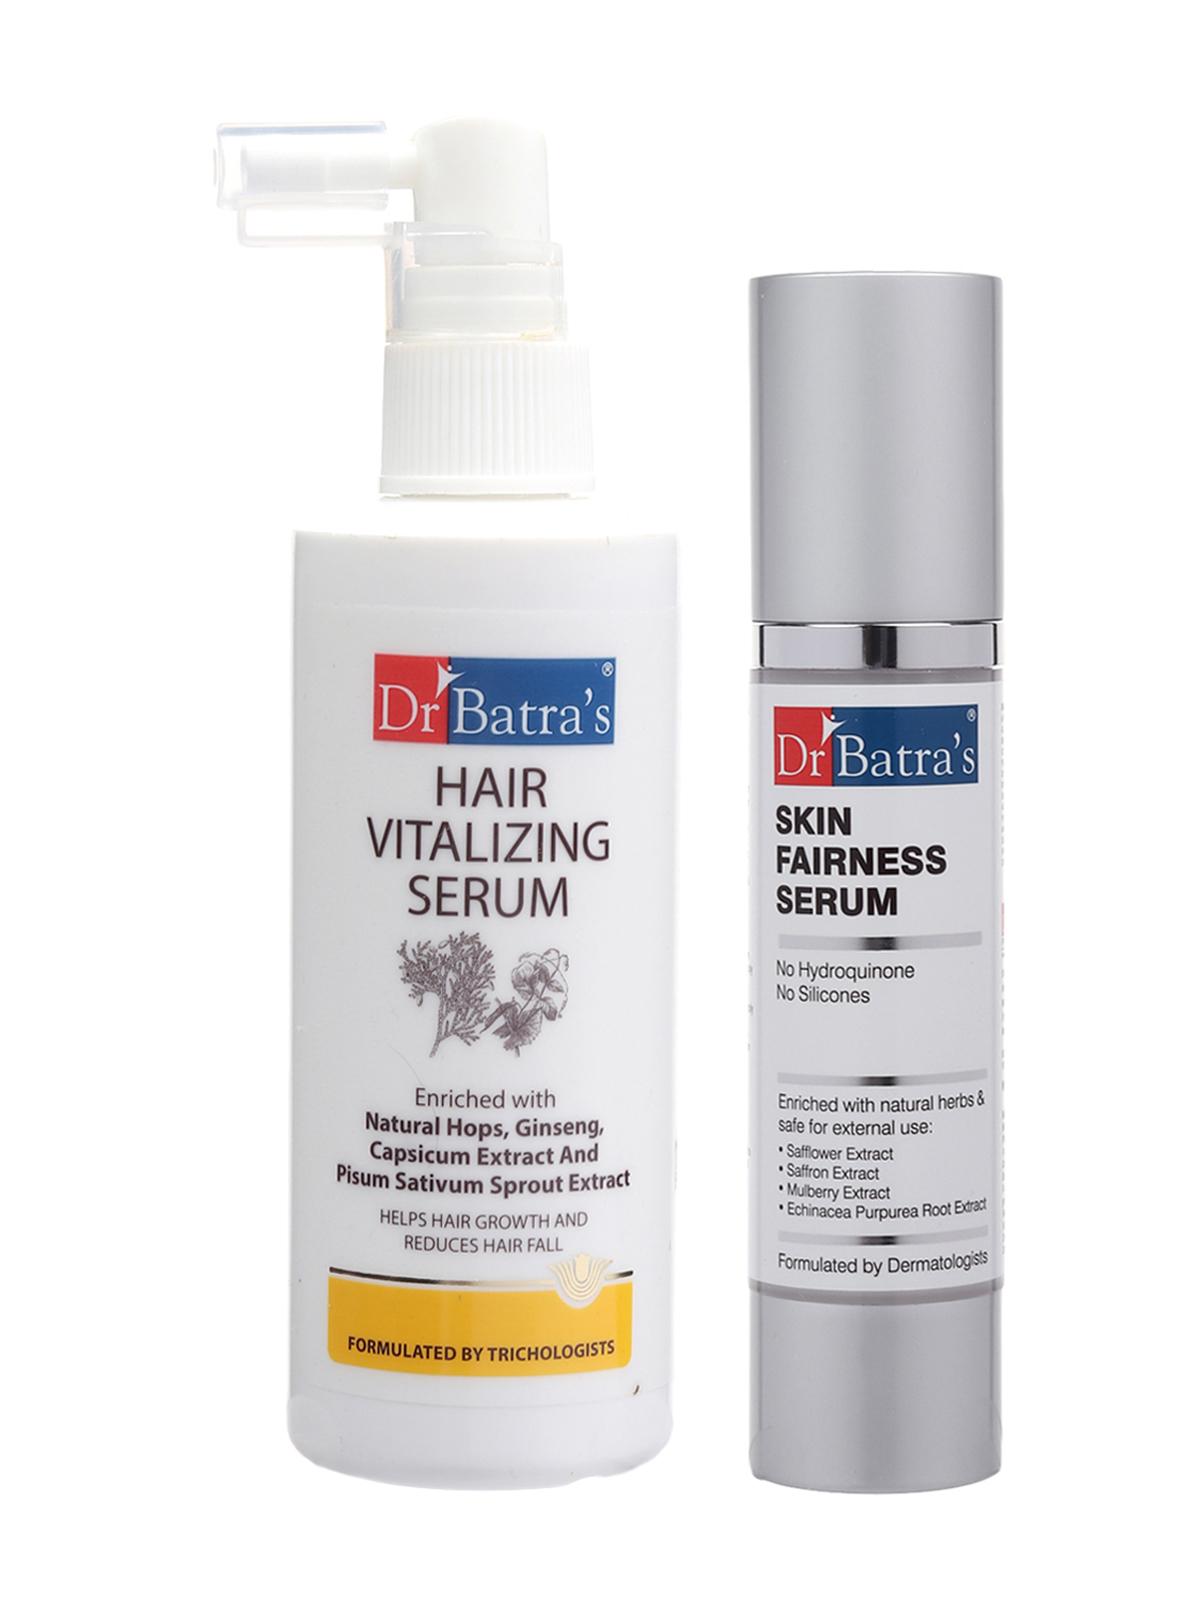 Dr Batra's | Dr Batra's Hair Vitalizing Serum 125ml and Skin Fairness Serum - 50 g (Pack of 2 for Men and Women)